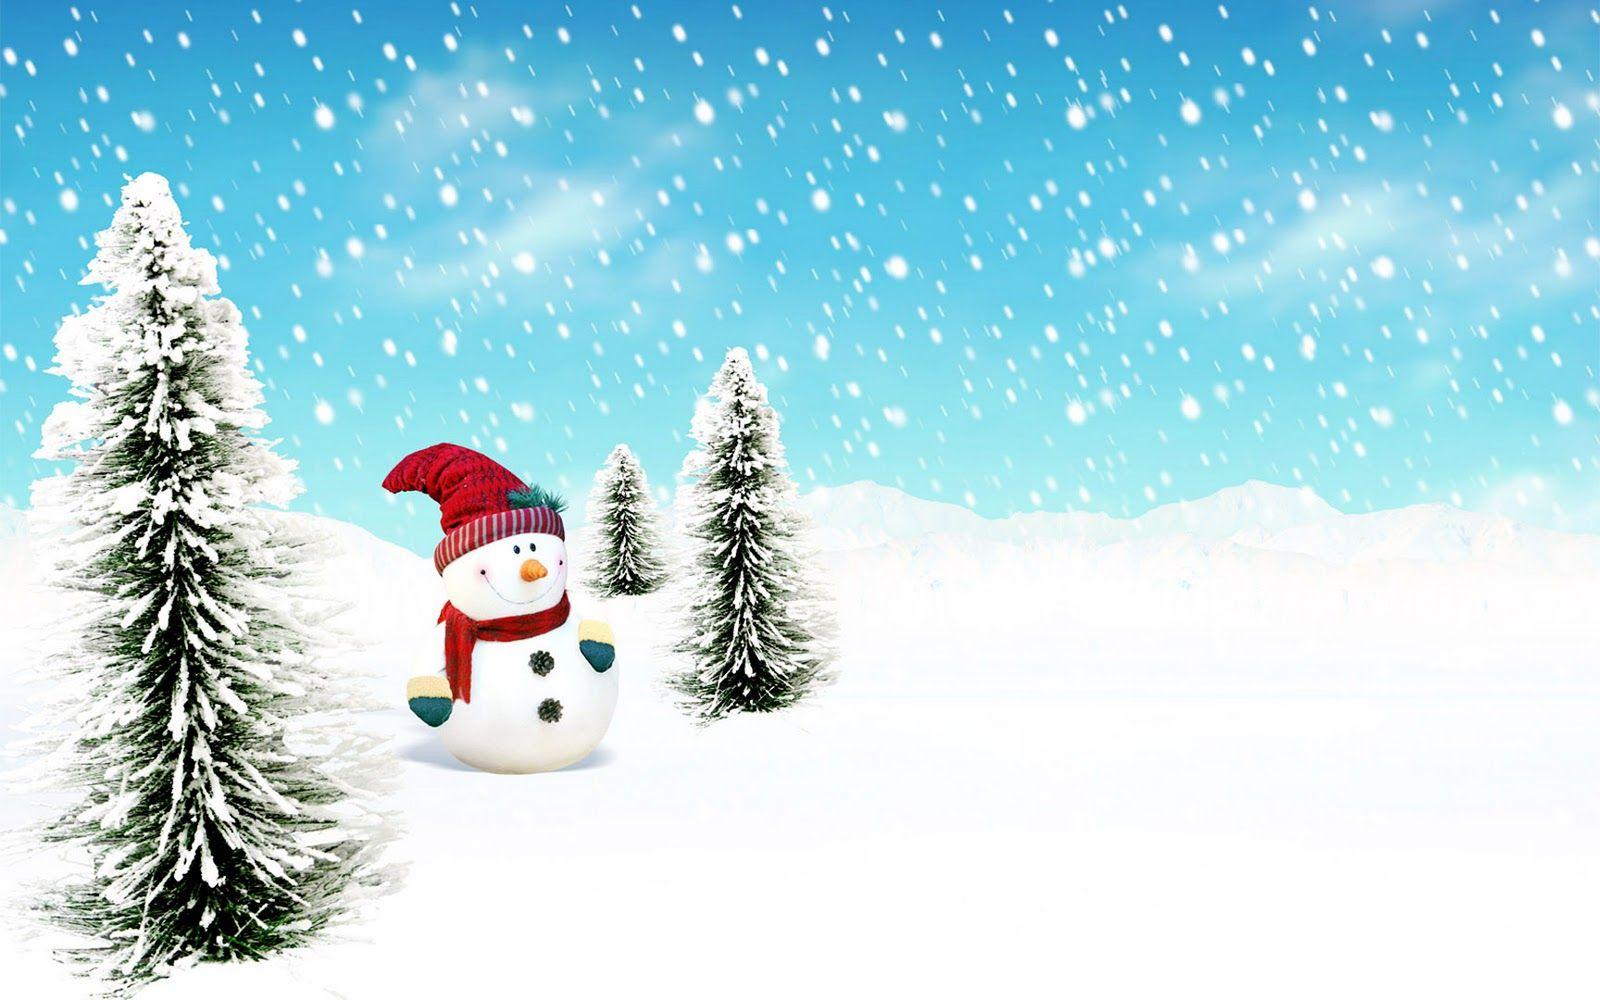 Cute Winter Wallpaper Christmas Wallpaper Hd Animated Christmas Wallpaper Christmas Wallpaper Backgrounds